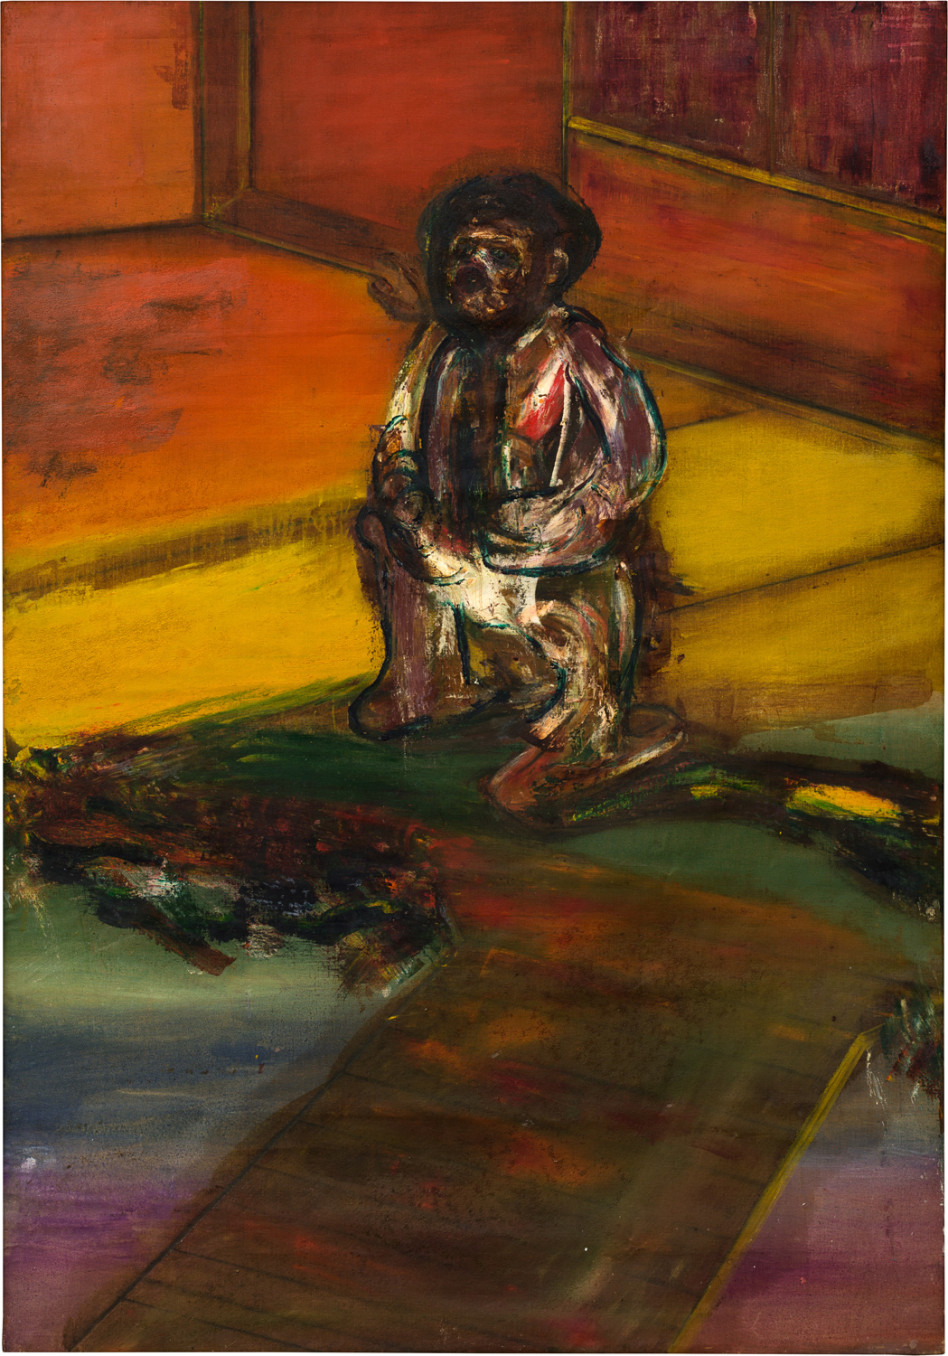 Frank Bowling, Beggar no. 6, 1963